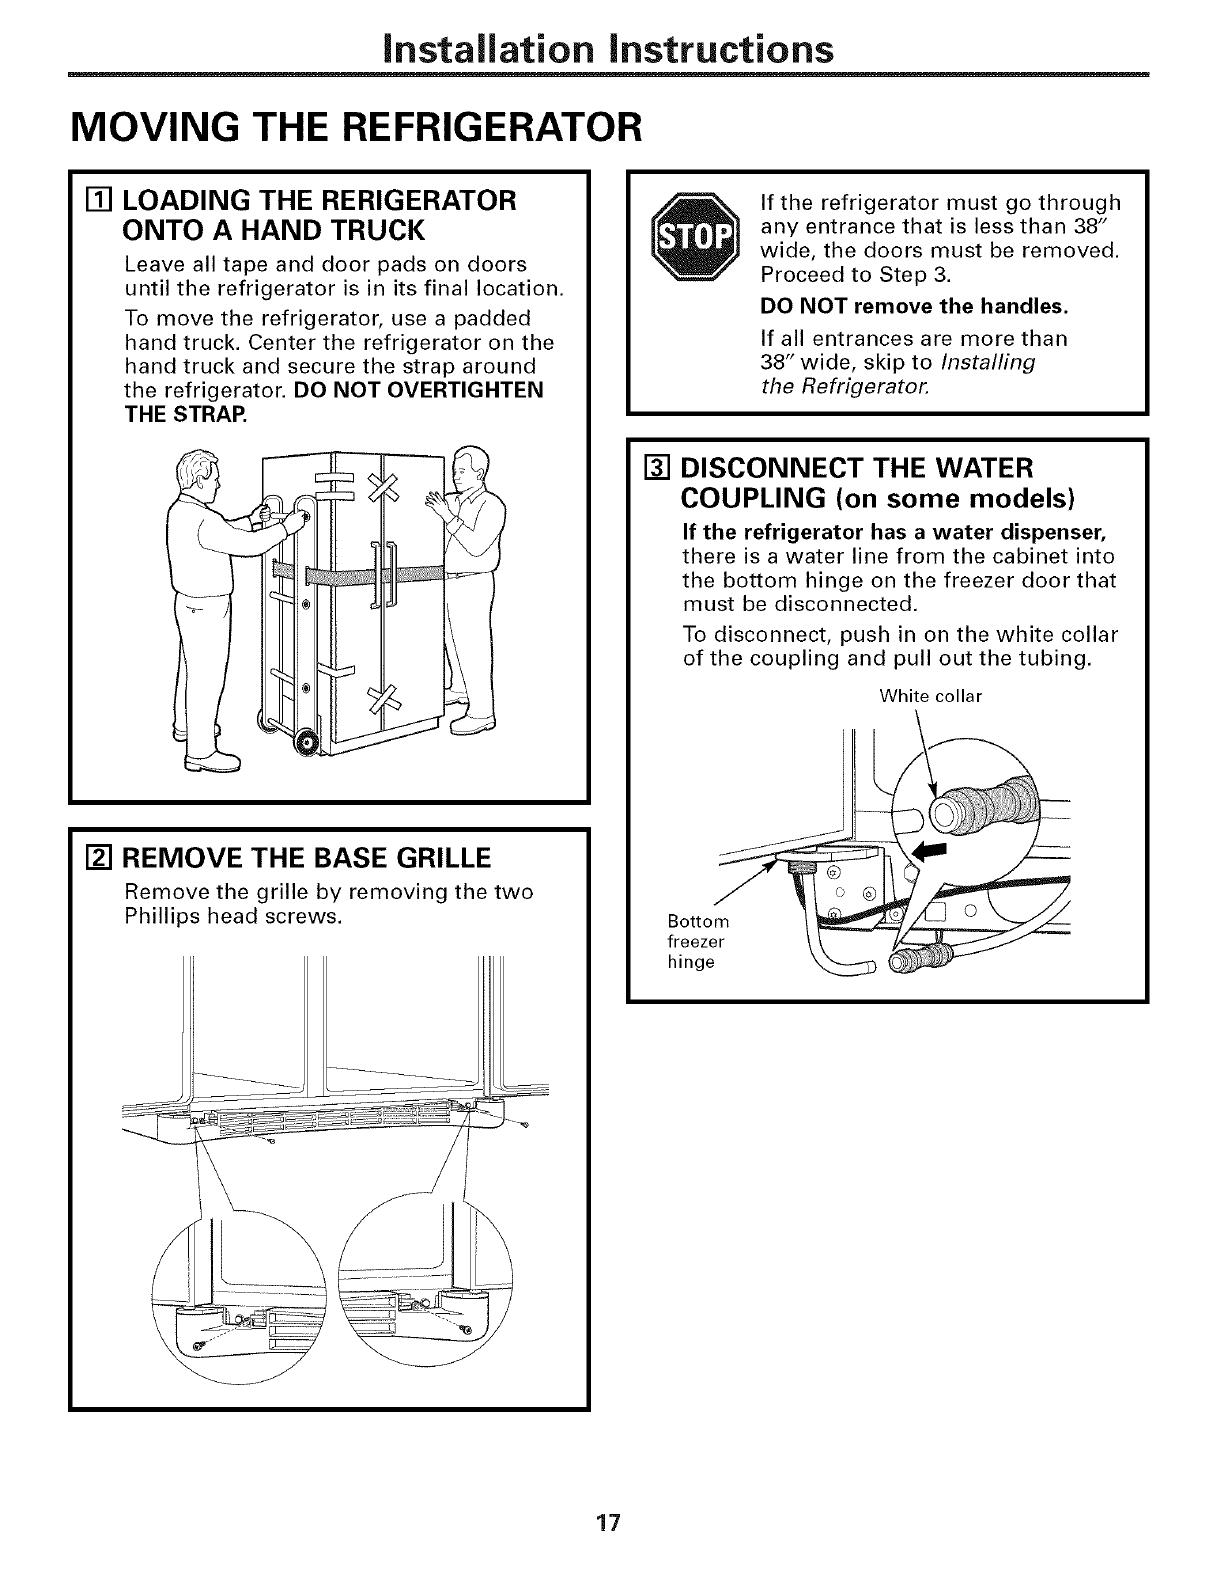 Ge Dsf25kgtabg User Manual Refrigerator T Series Manuals And Guides Dc Reversing Relay Wiring Diagram Hecho L0604560